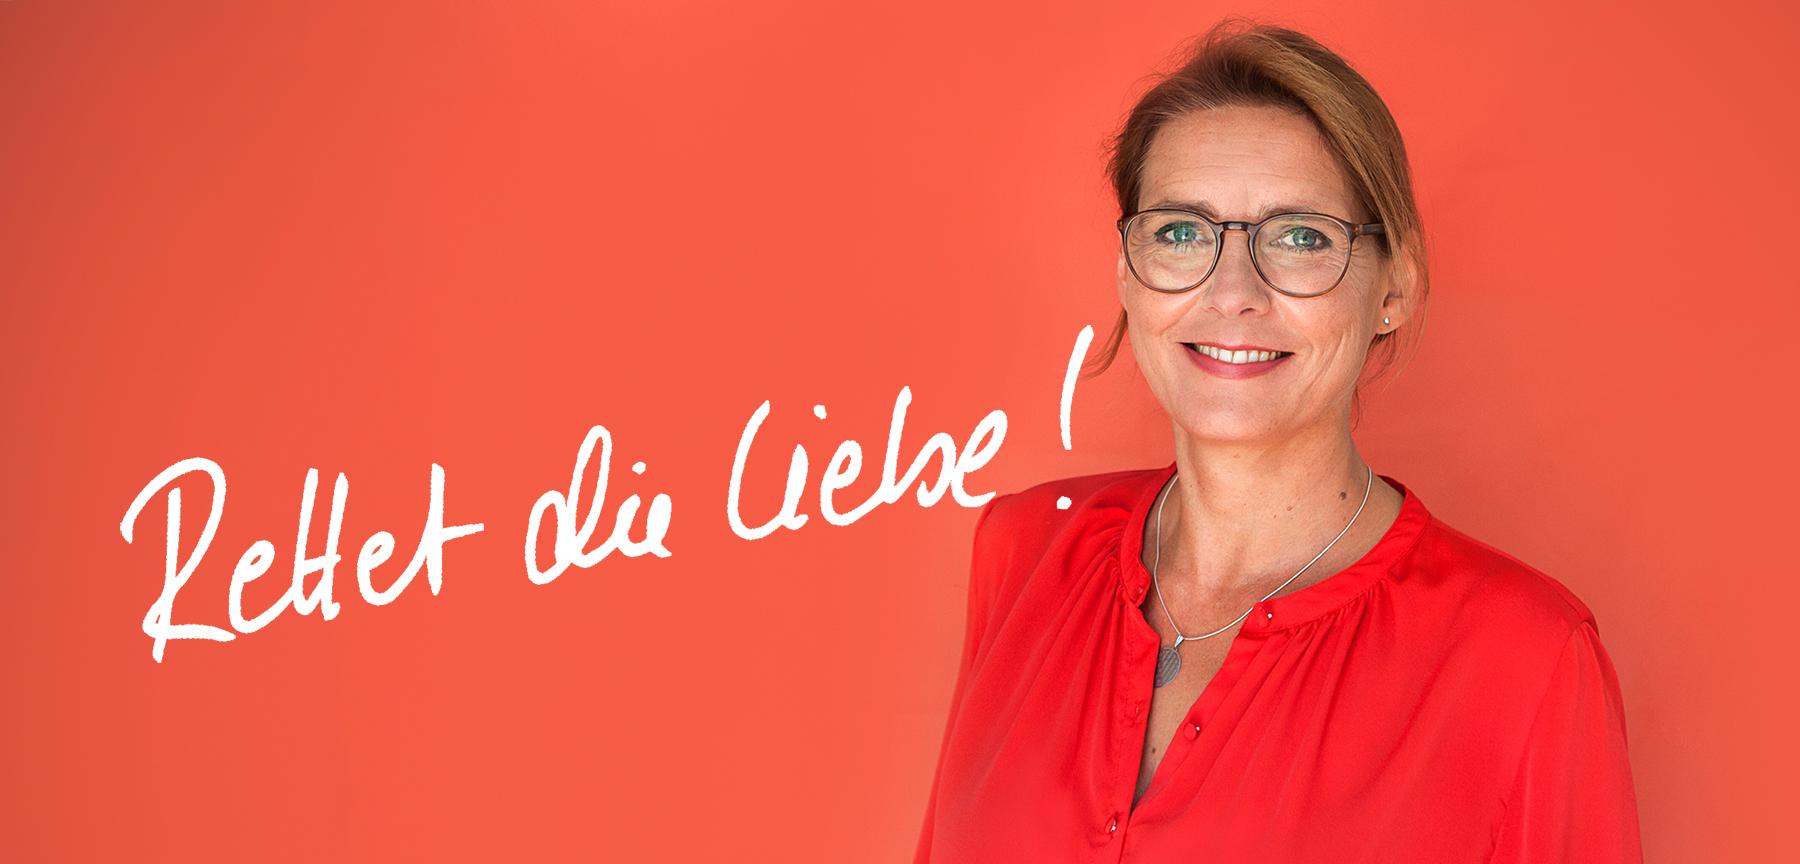 Paarberatung Liebe Hamburg Psychologische Beratung